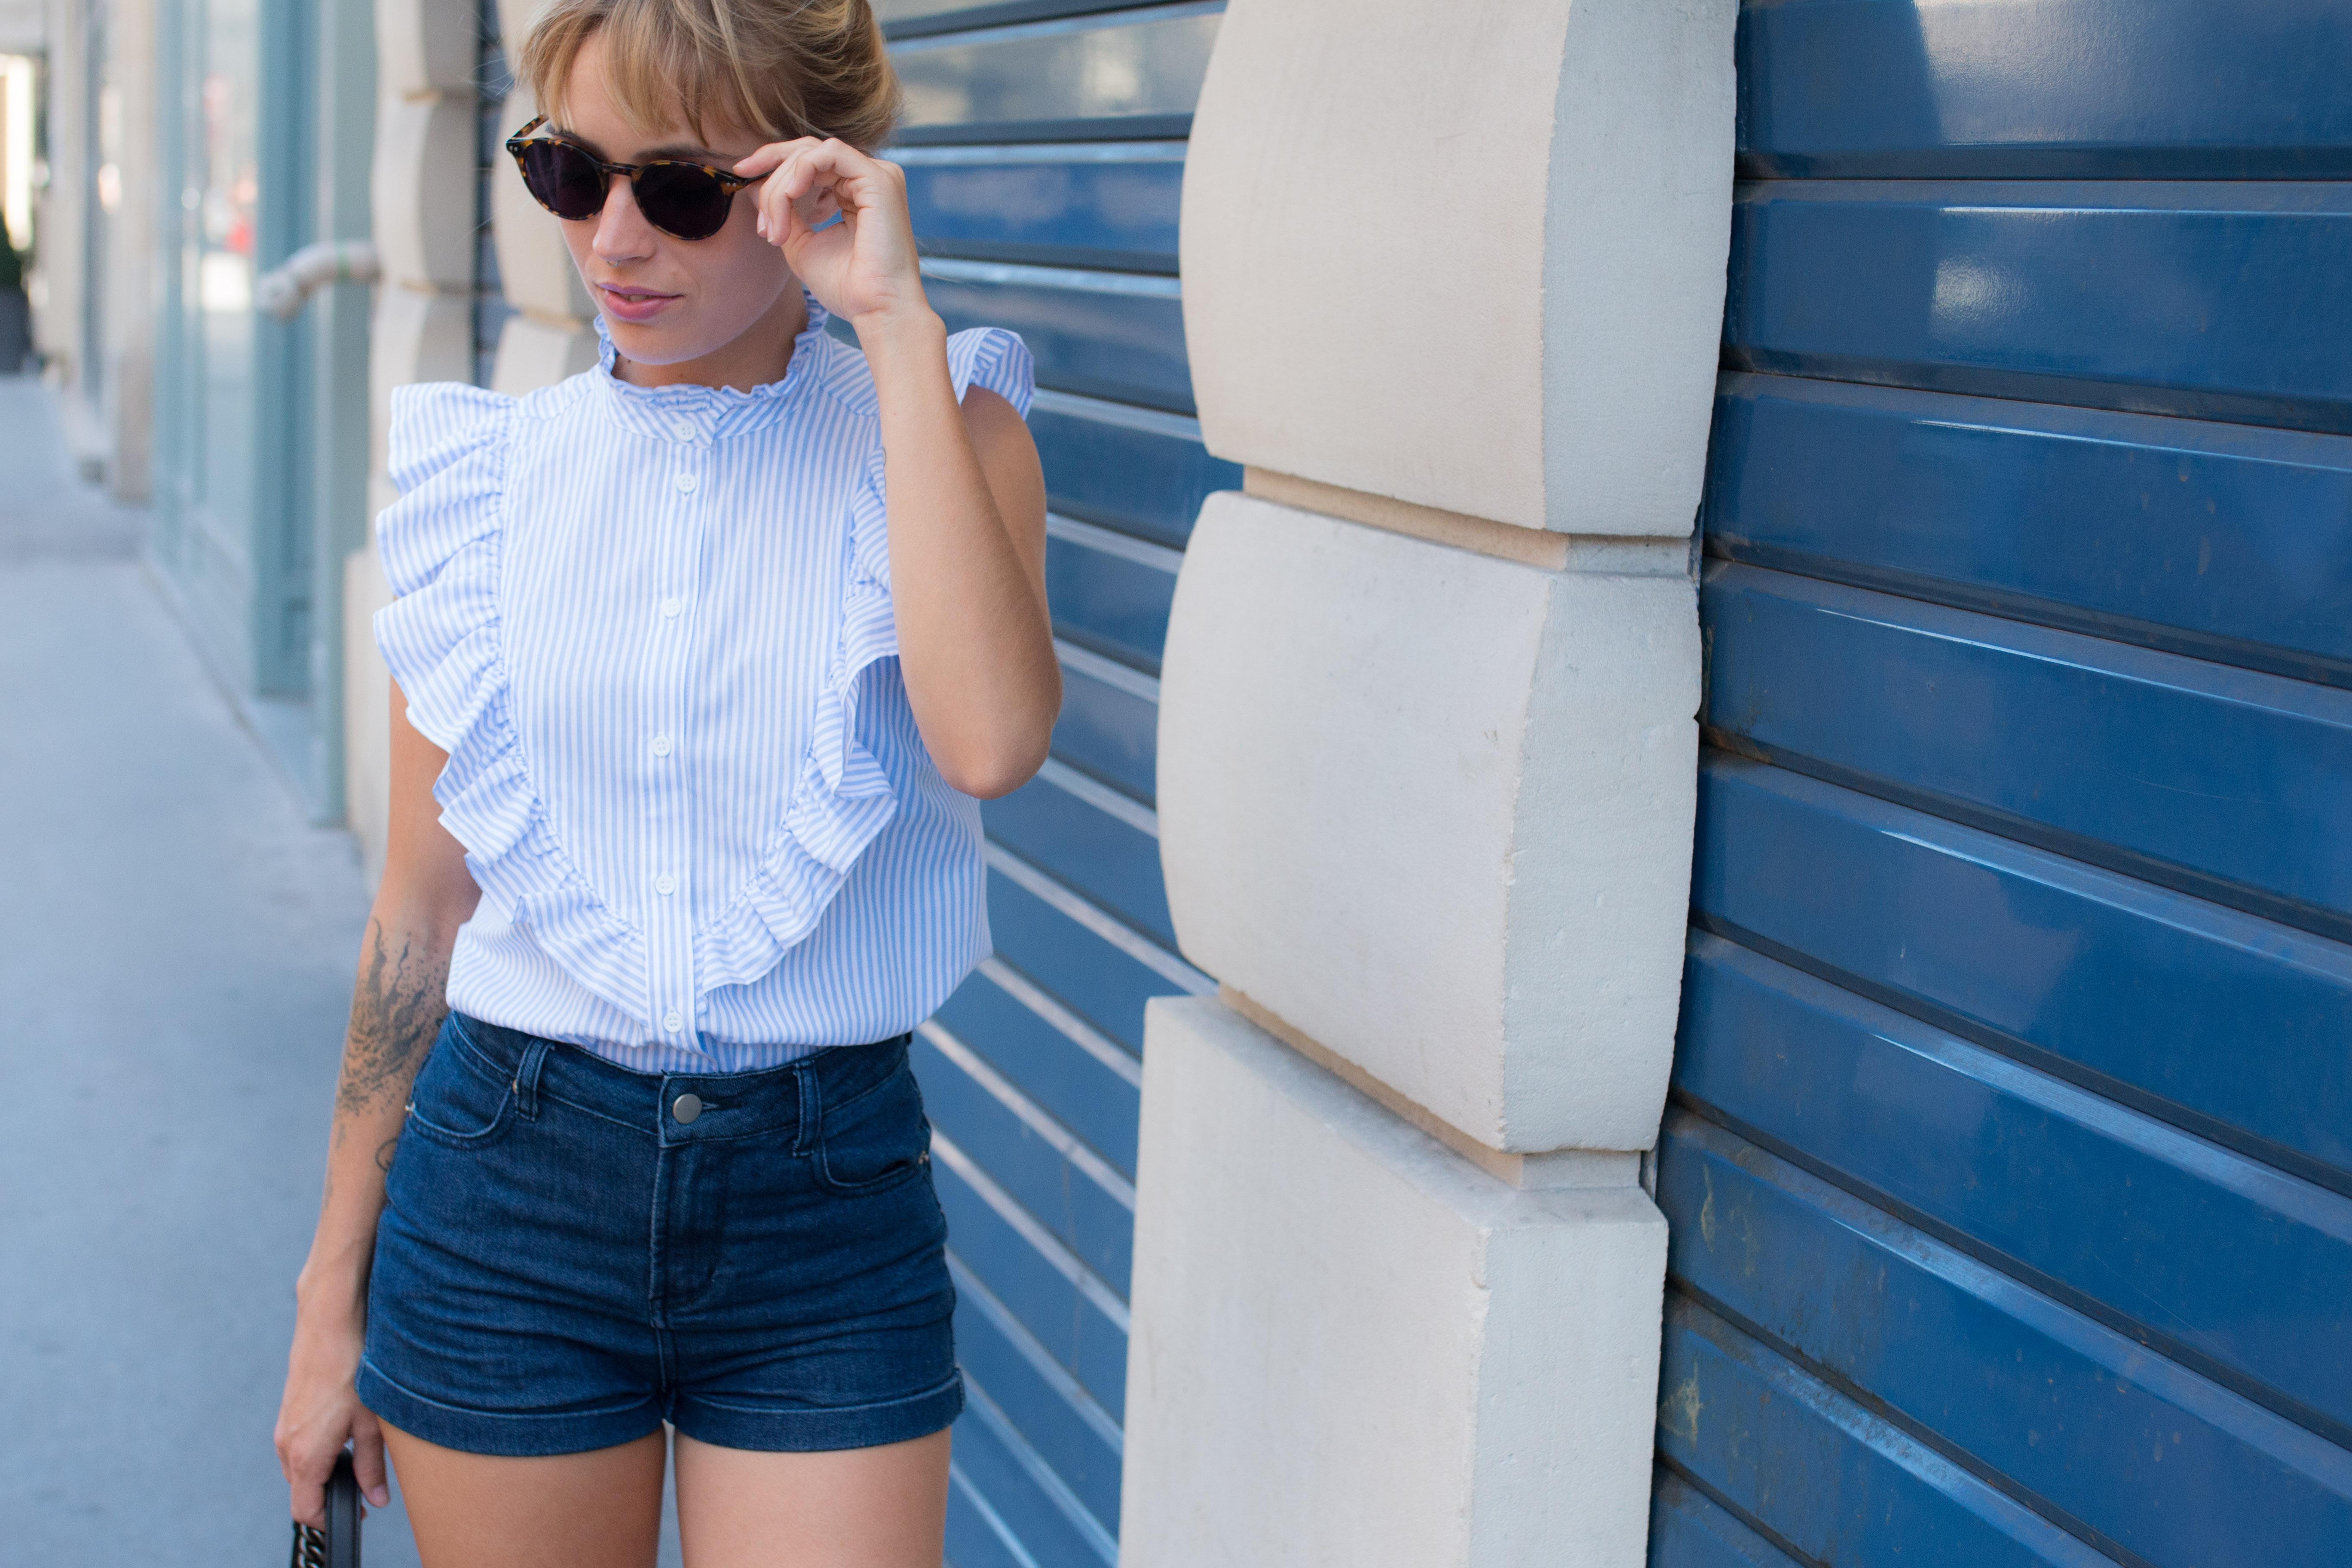 Top froufrou a rayures , short en jean et espadrille I Sp4nkblog-13